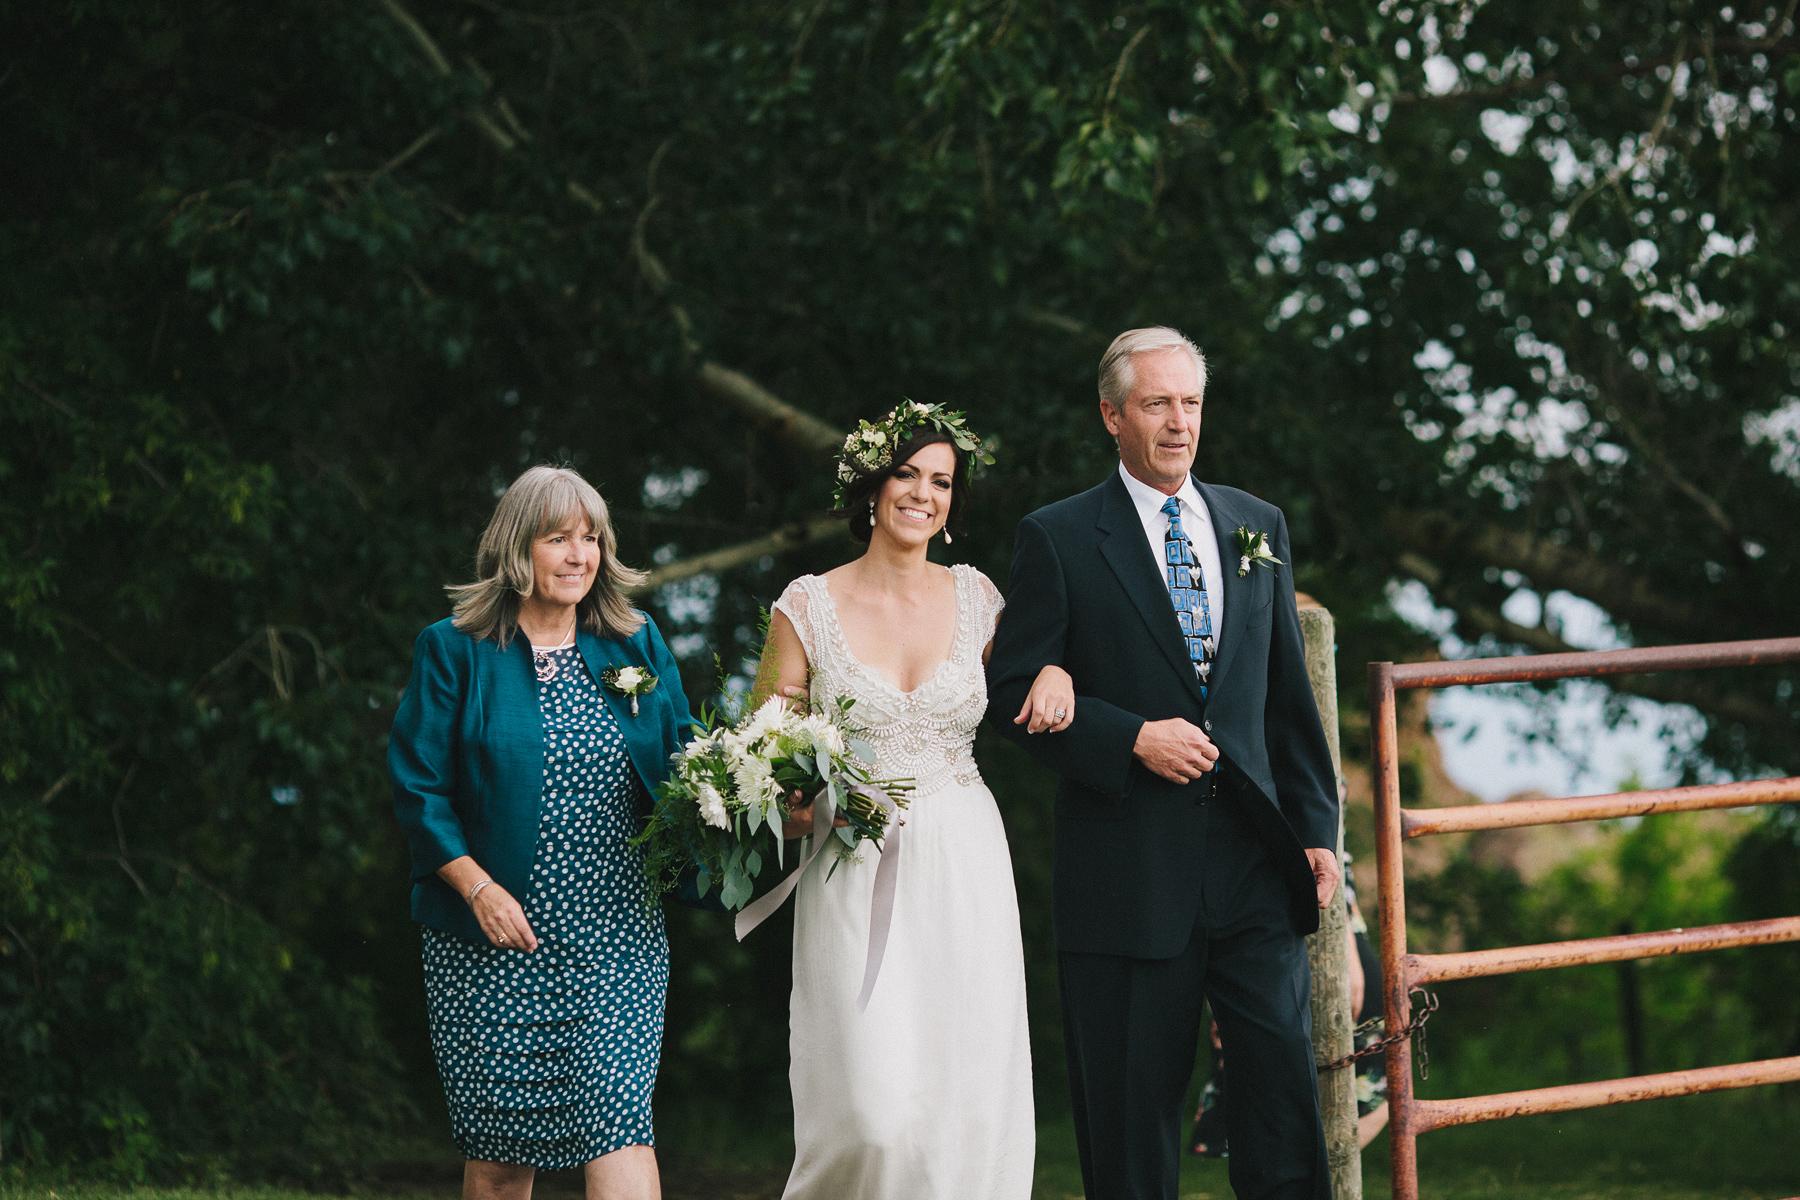 alberta-farm-wedding-photographer-rp-wj-098.jpg